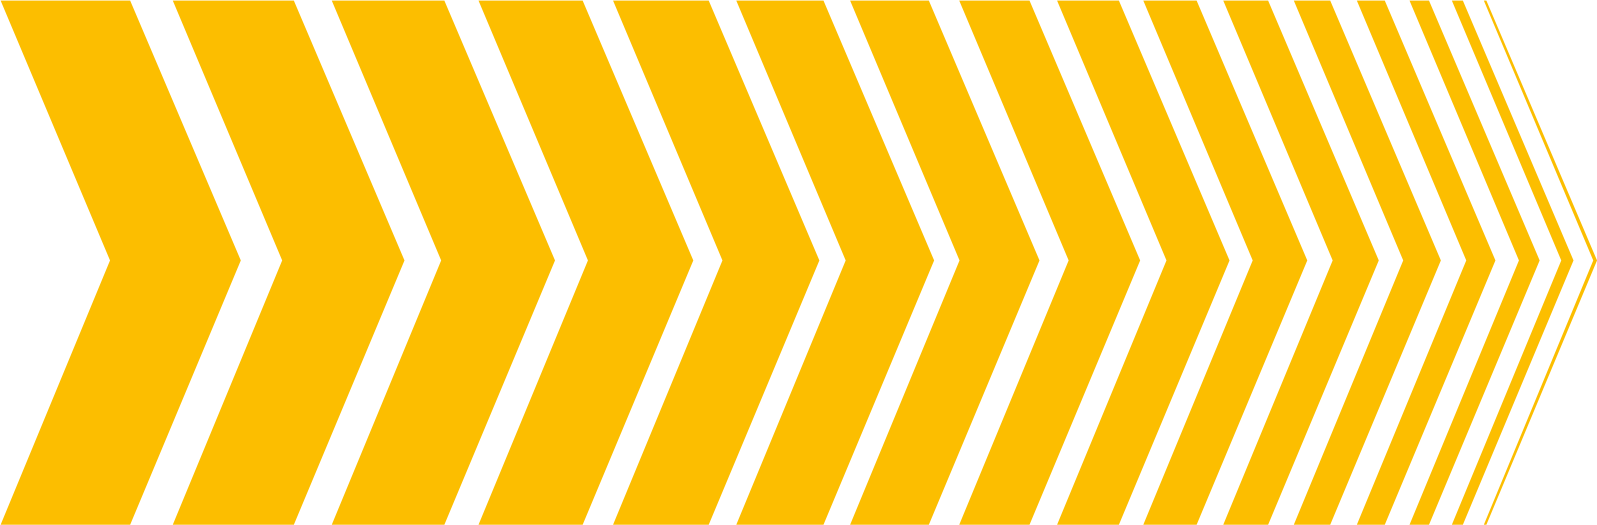 svg black and white stock Yellow zebra big image. Arrow clipart road.